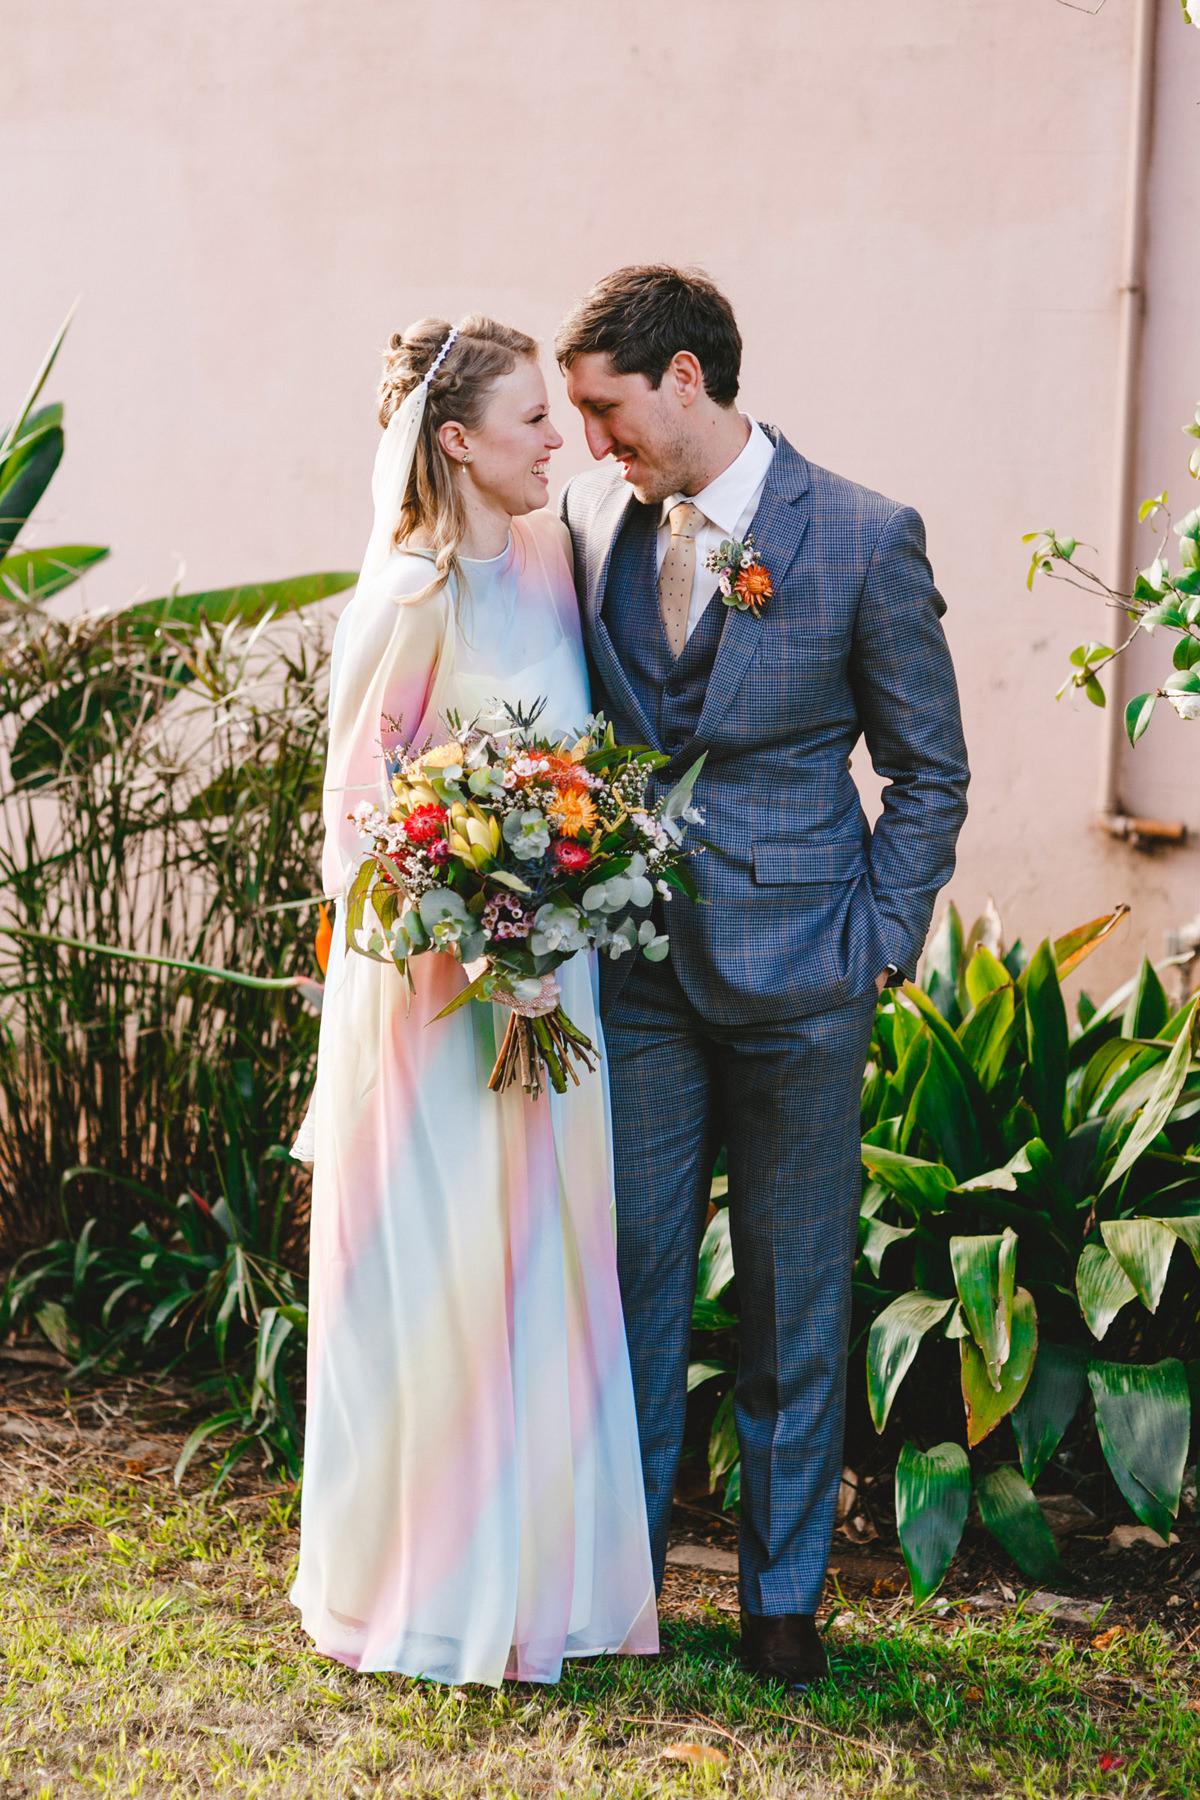 Handmade Rainbow Garden Wedding Polka Dot Bride